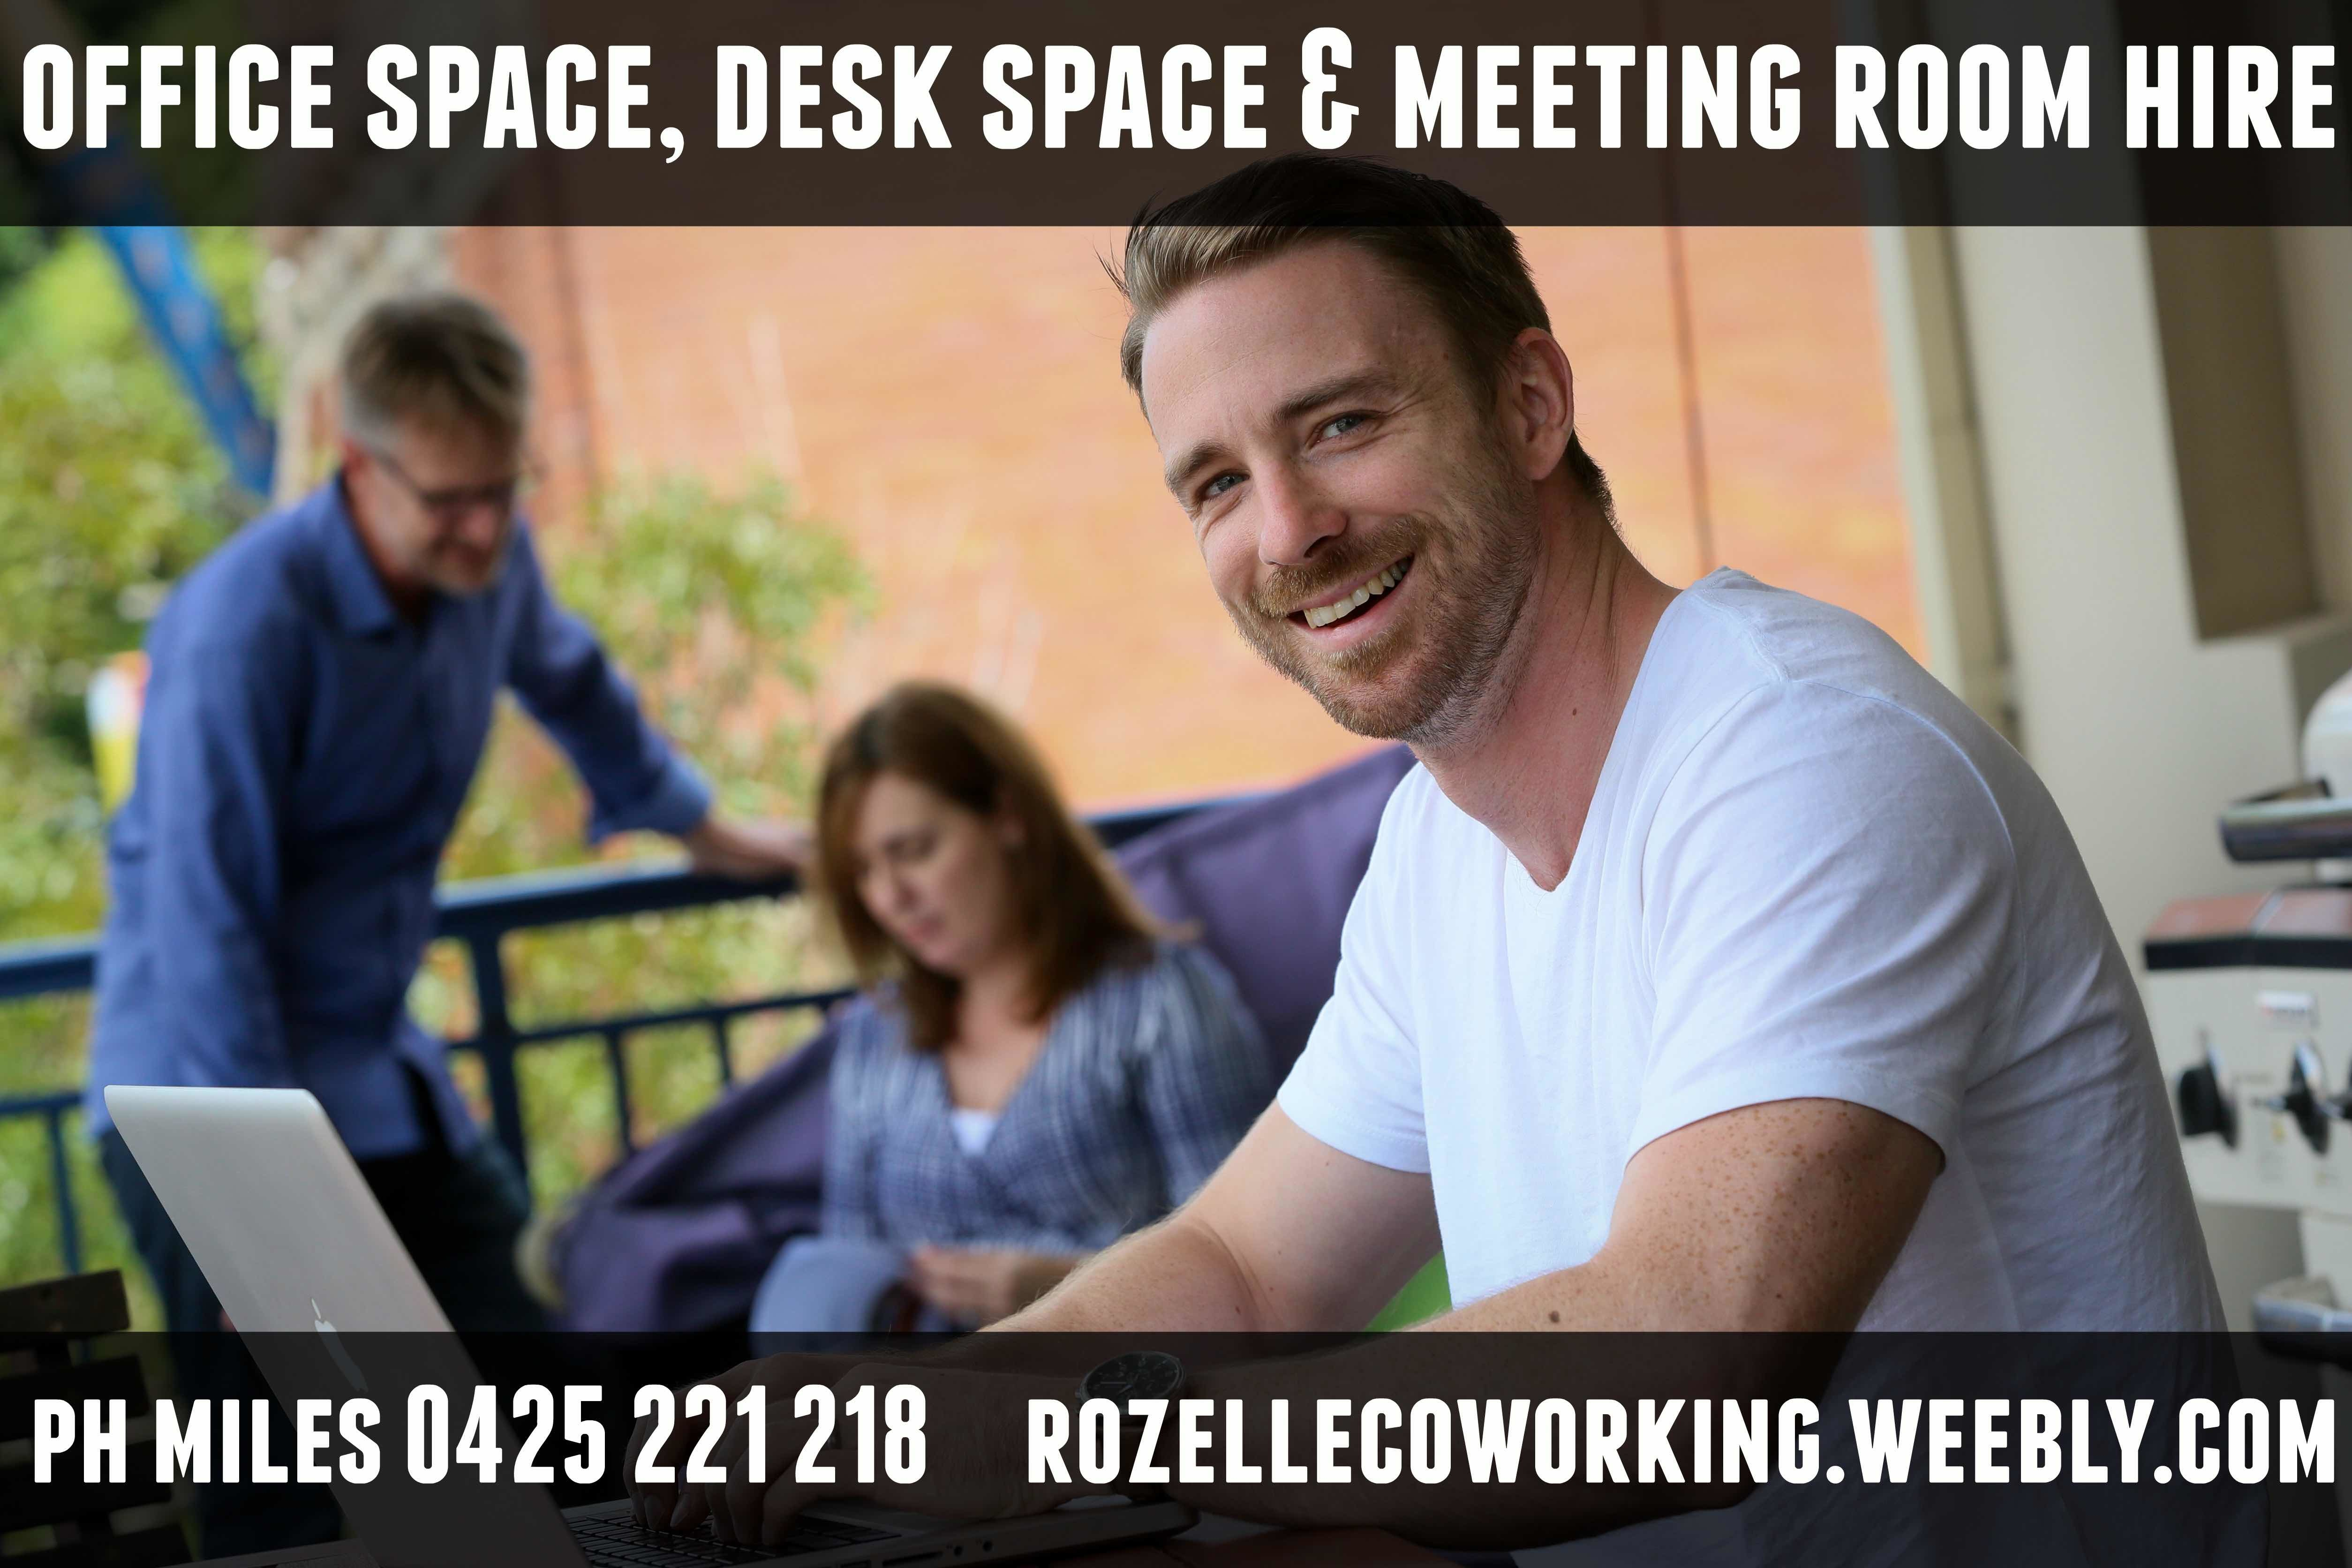 Meeting Room Hire Near Me